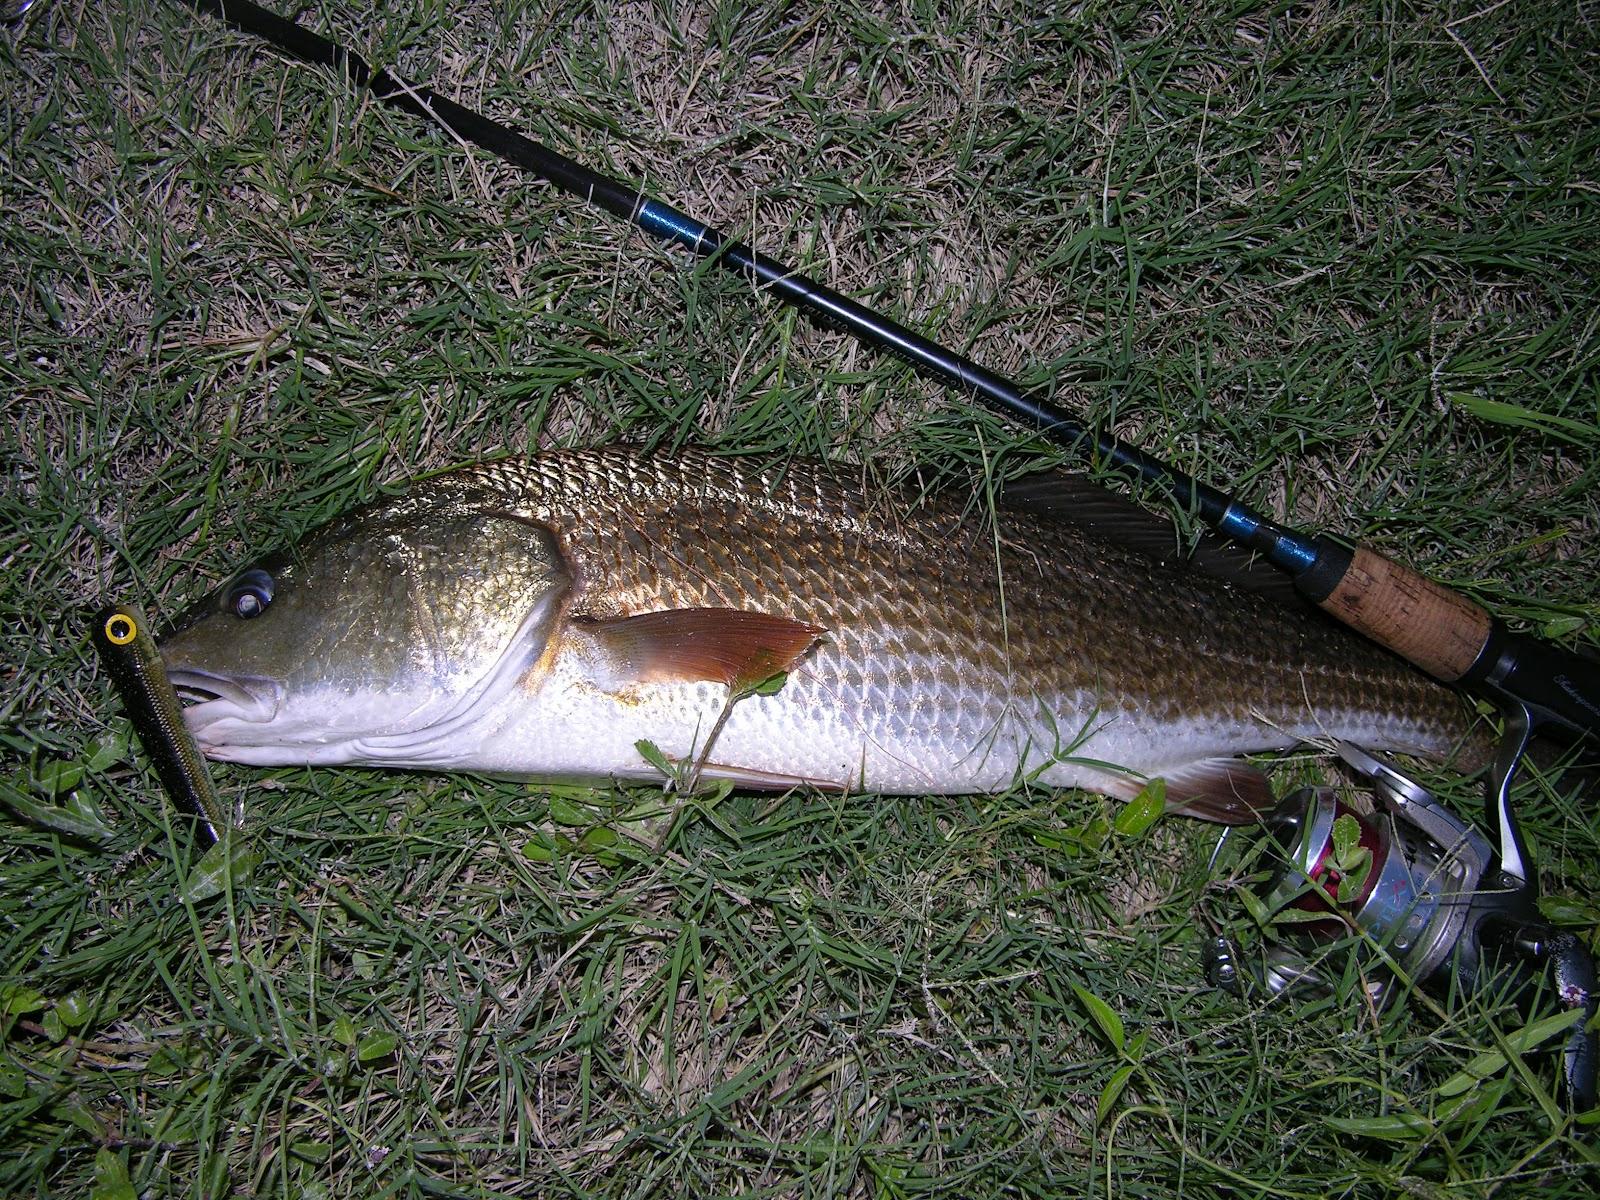 Mosquito lagoon indian river fishing catfish creek loop for Indian river fishing